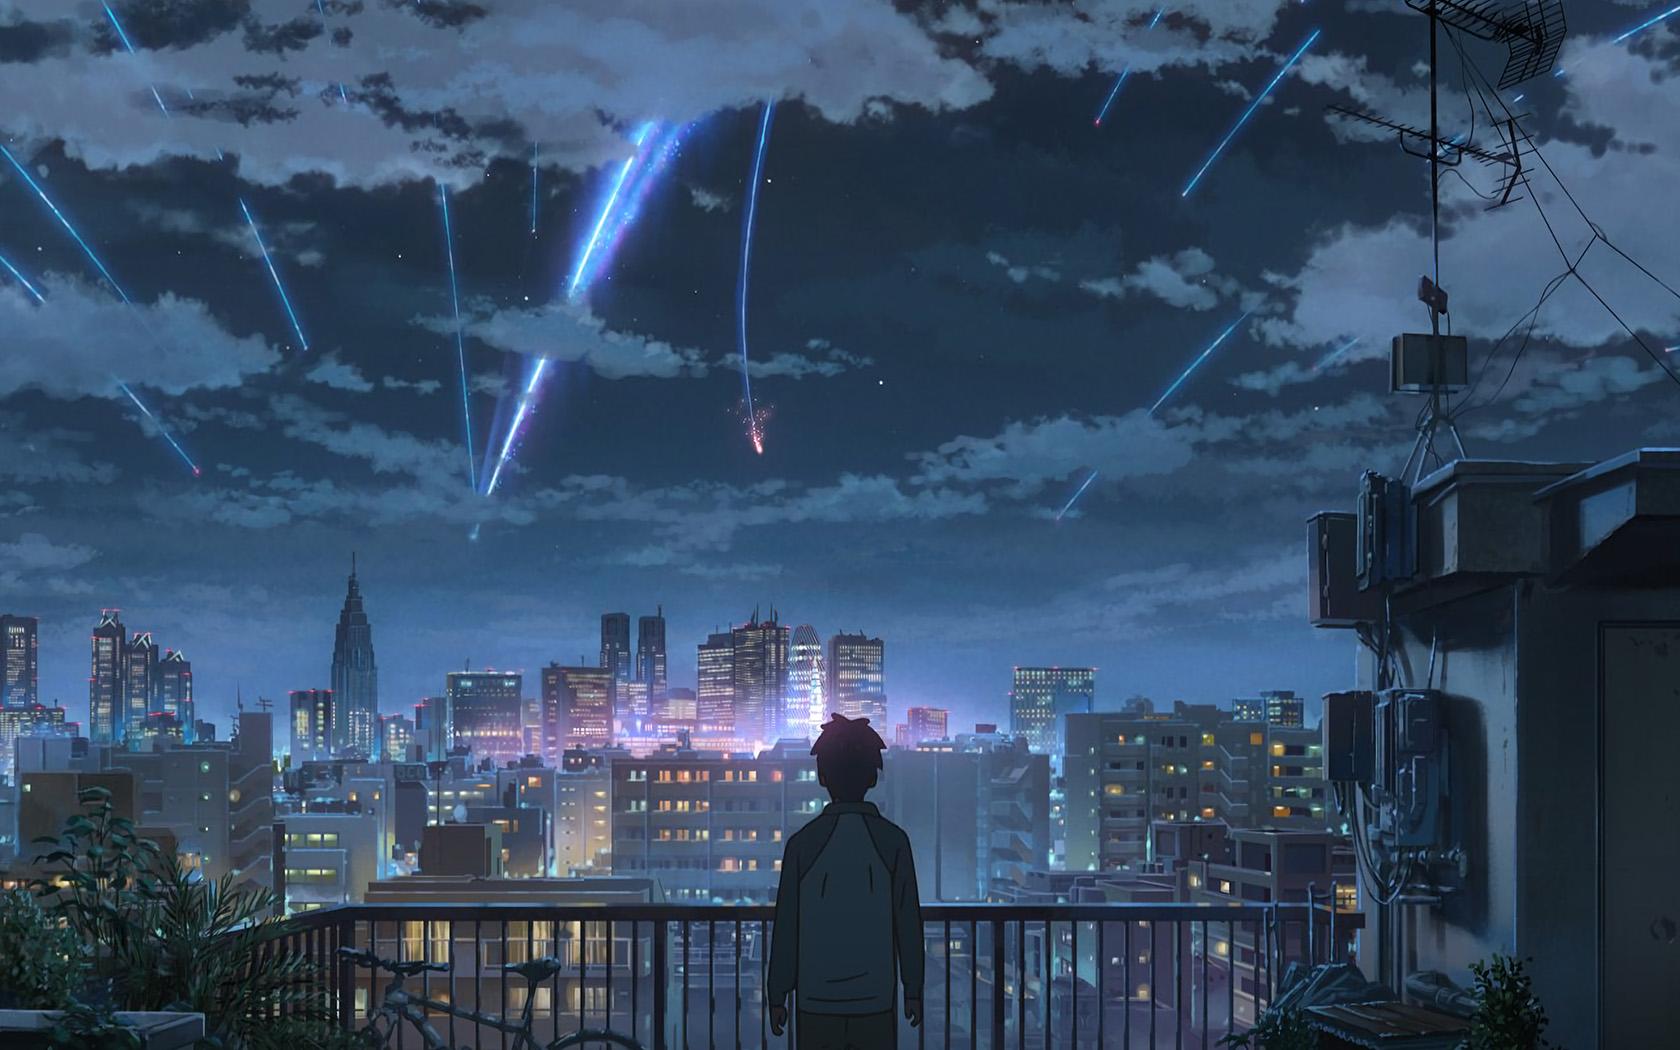 Aw28 Yourname Night Anime Sky Illustration Art Wallpaper